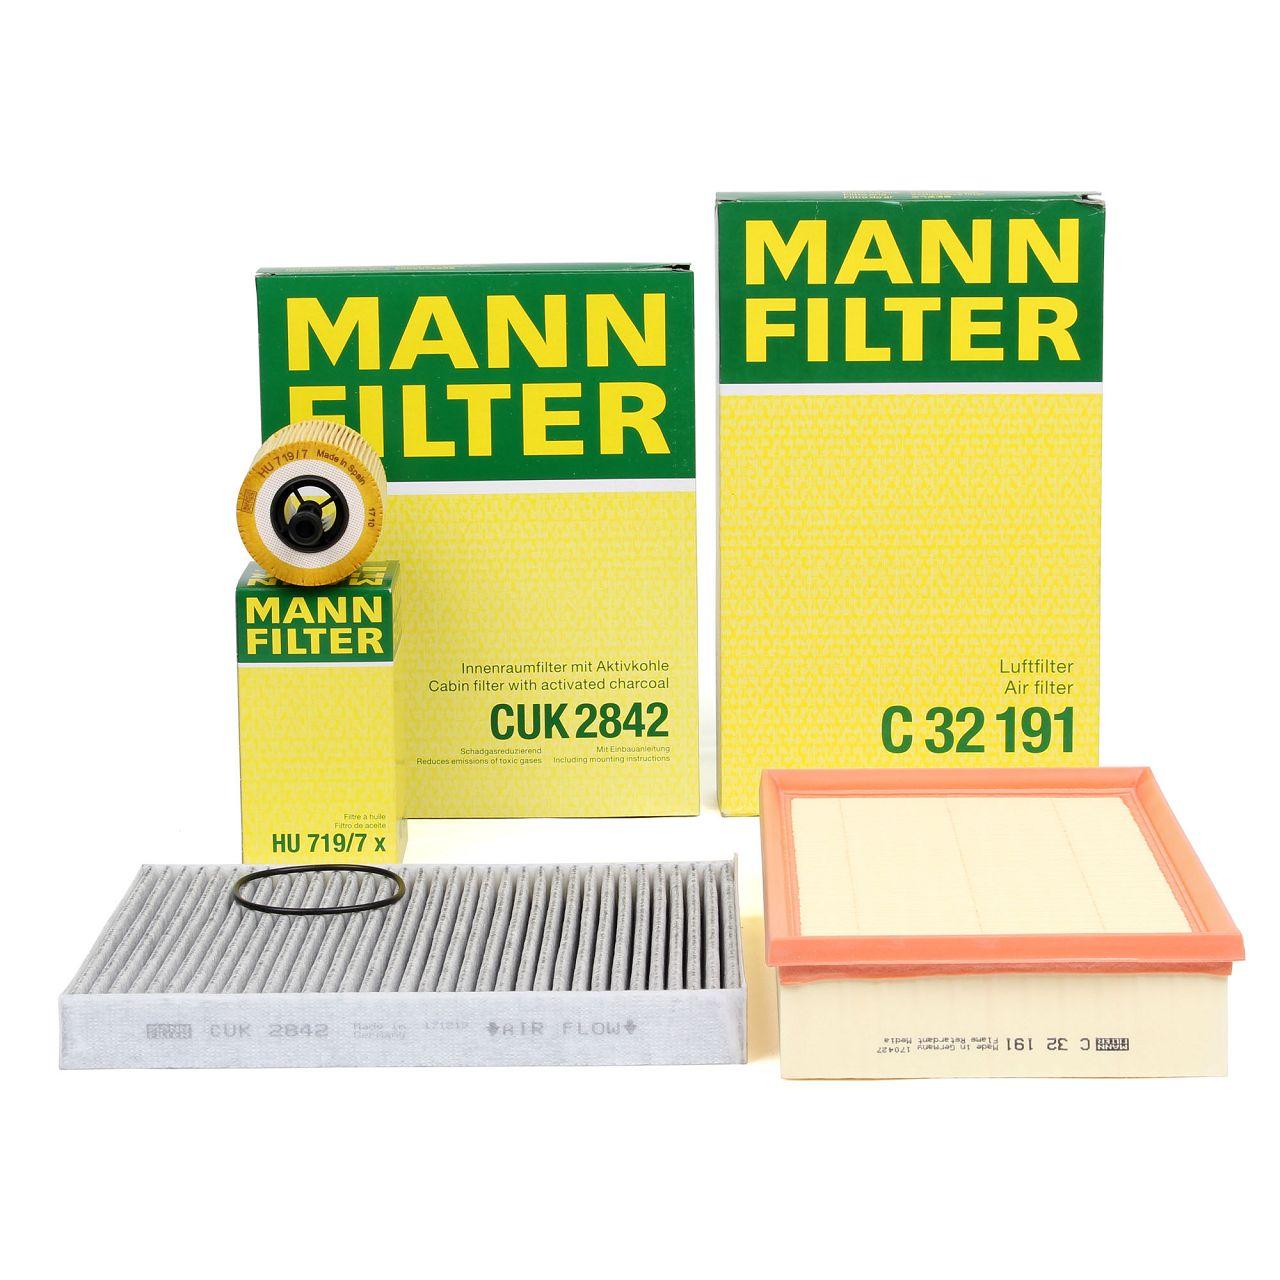 MANN Filterpaket Filterset für VW MULTIVAN TRANSPORTER T5 1.9/2.5 TDI 85-174 PS